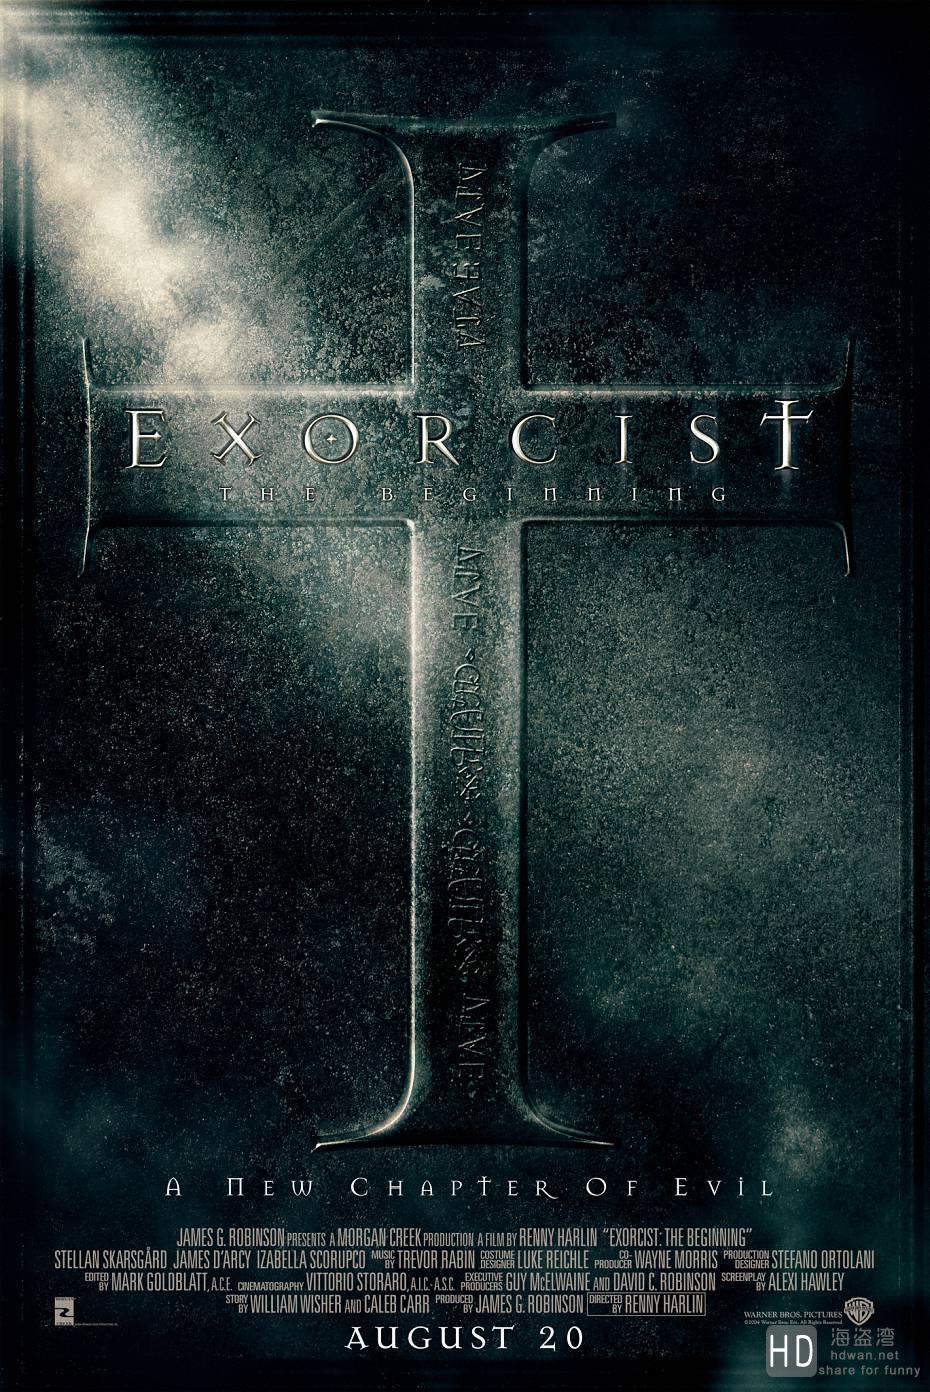 [2005][美国][驱魔人前传 Dominion: Prequel to the Exorcist][1080P/BT高清电影下载]